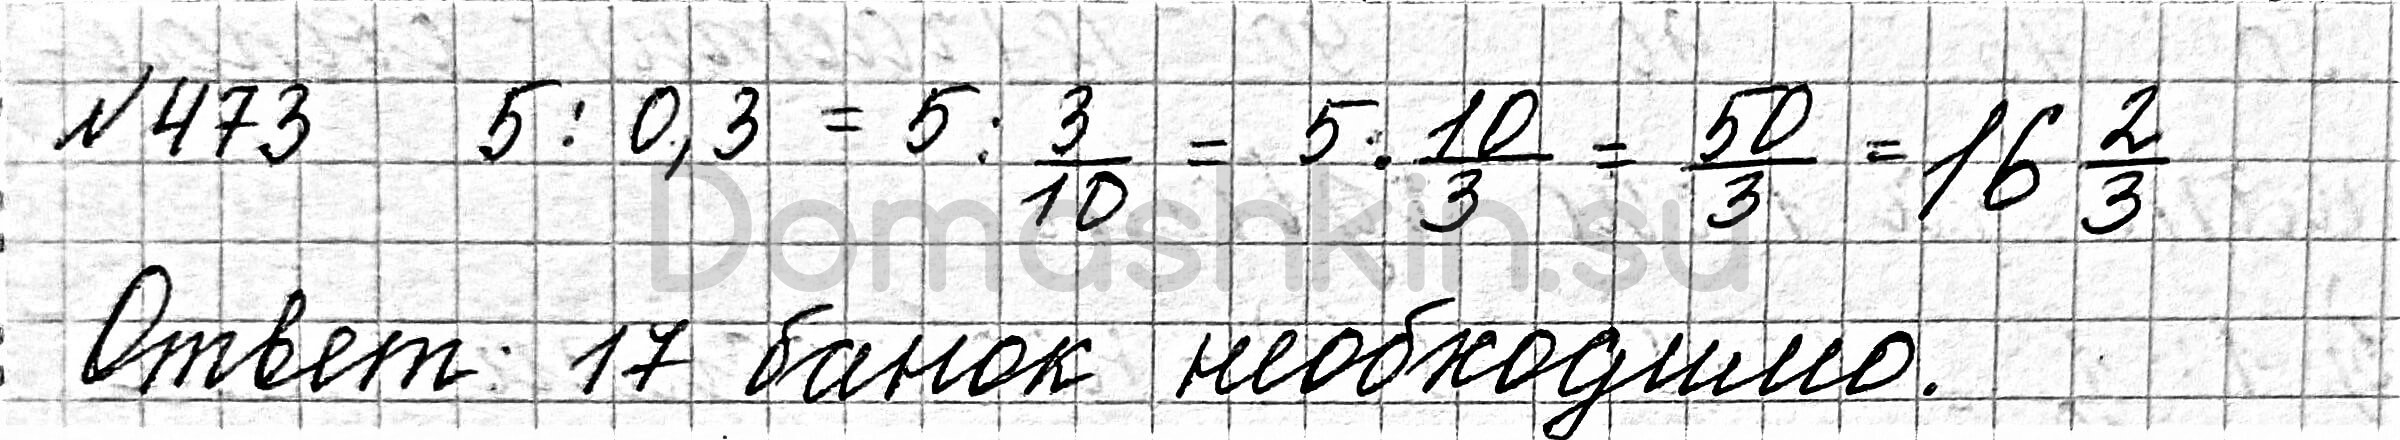 Математика 6 класс учебник Мерзляк номер 473 решение